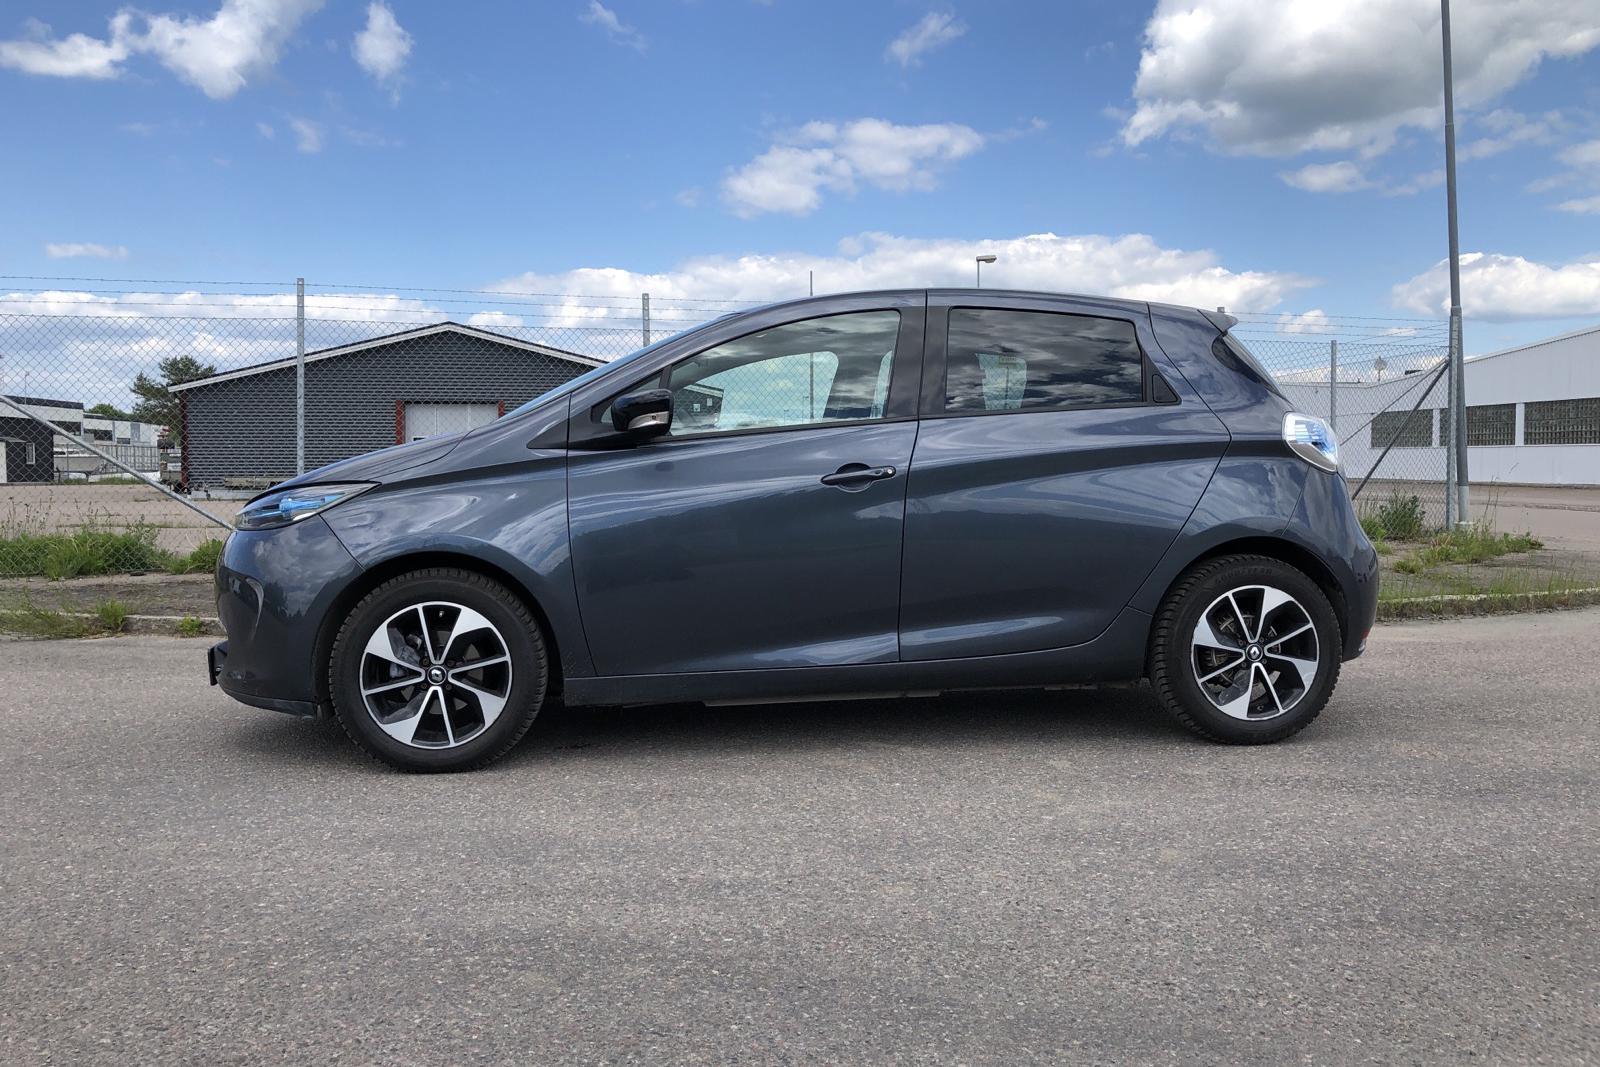 Renault Zoe 41 kWh R90 (92hk) - 88 140 km - Automatic - gray - 2018